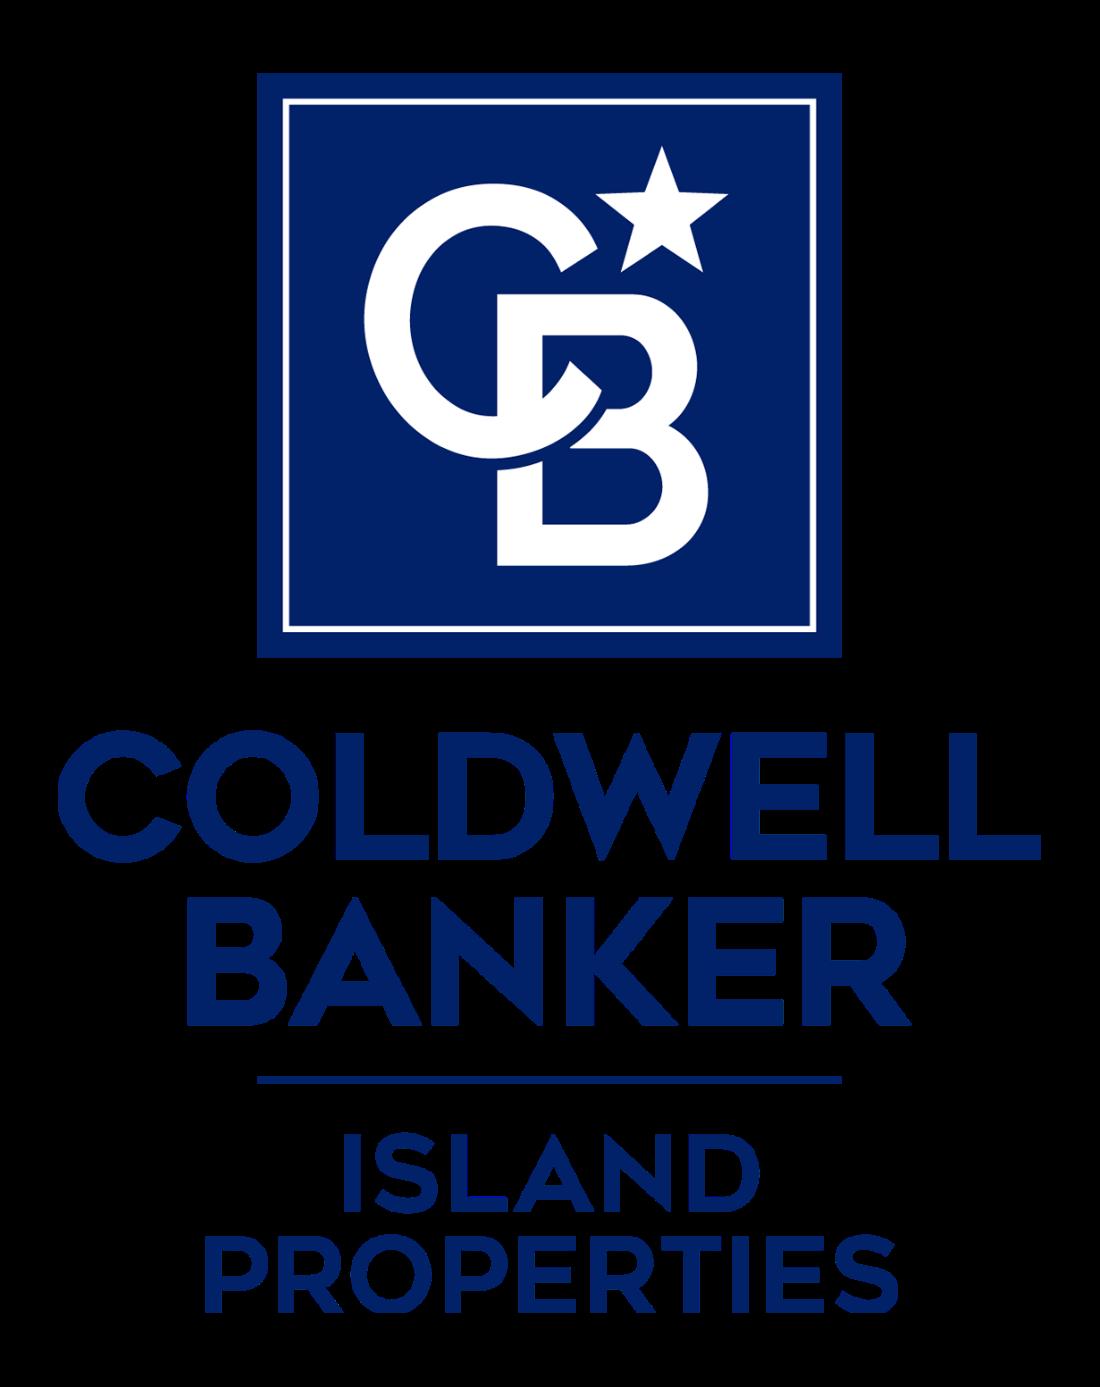 Jo Anne C. Evangelista - Coldwell Banker Island Properties Logo